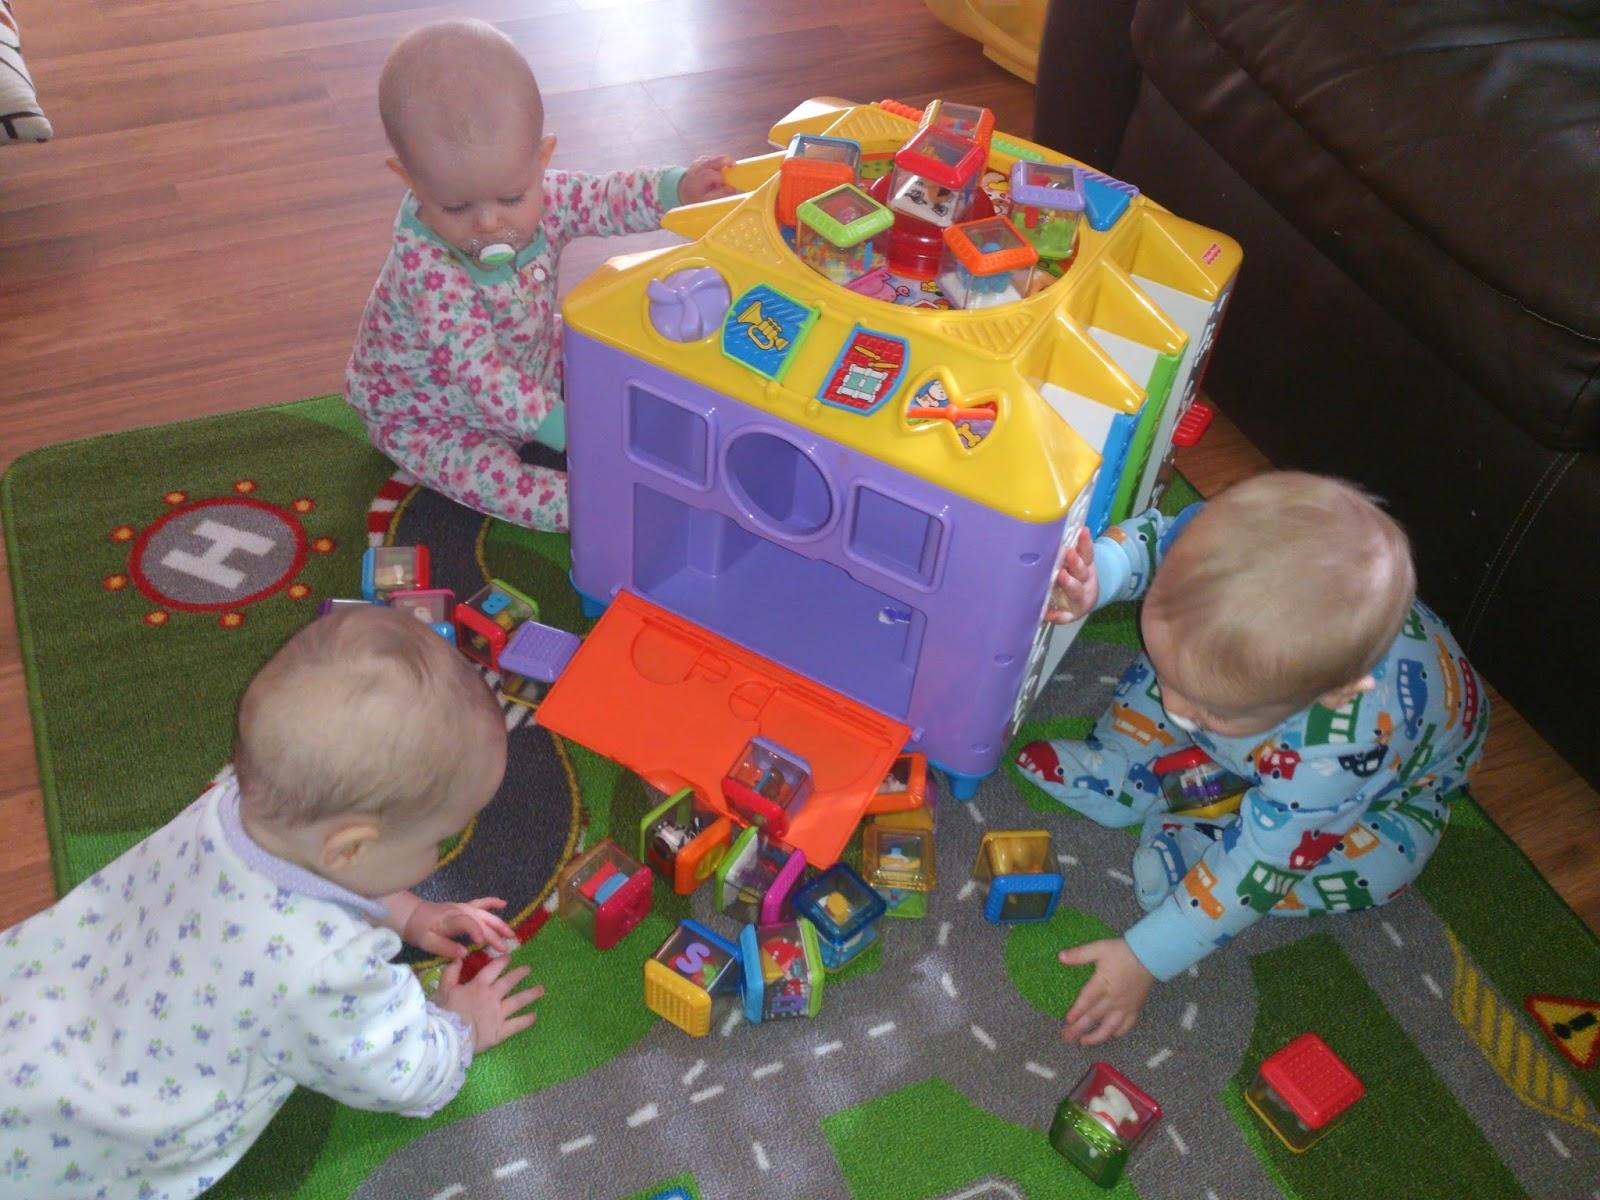 Triplets Toddler 8 Month Old Playtime